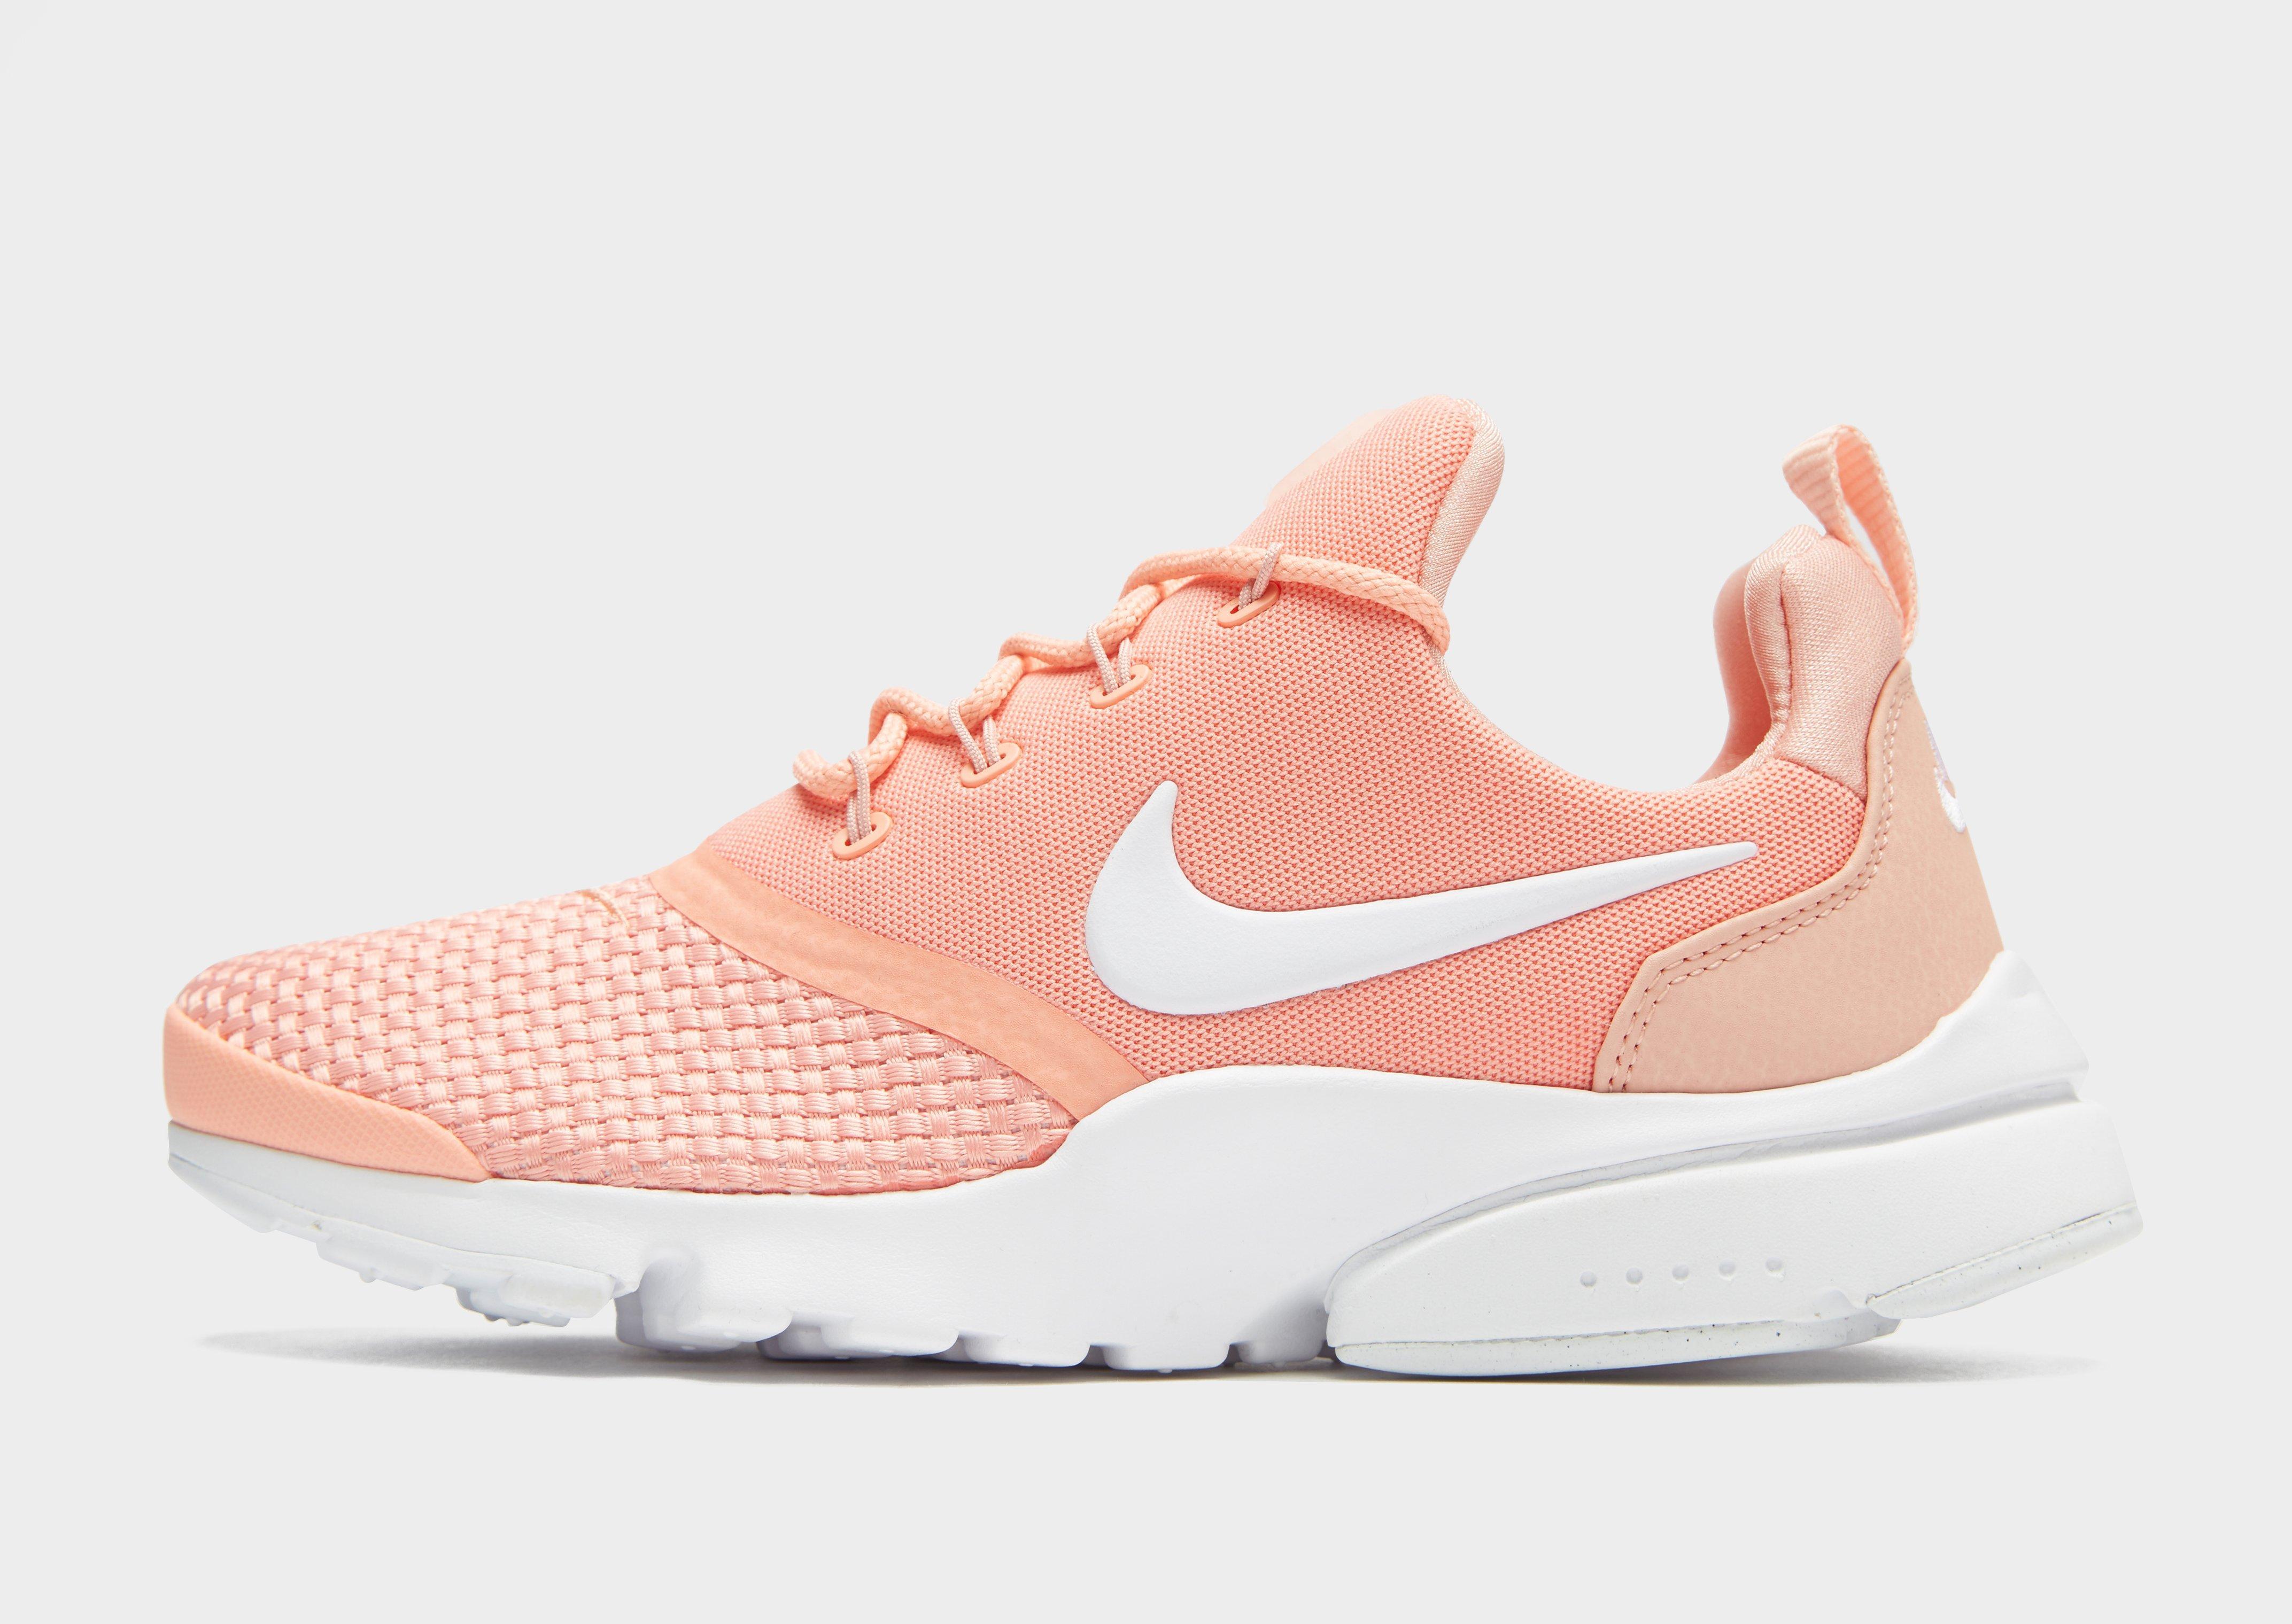 finest selection e7c76 1d062 teal nike women s shoes